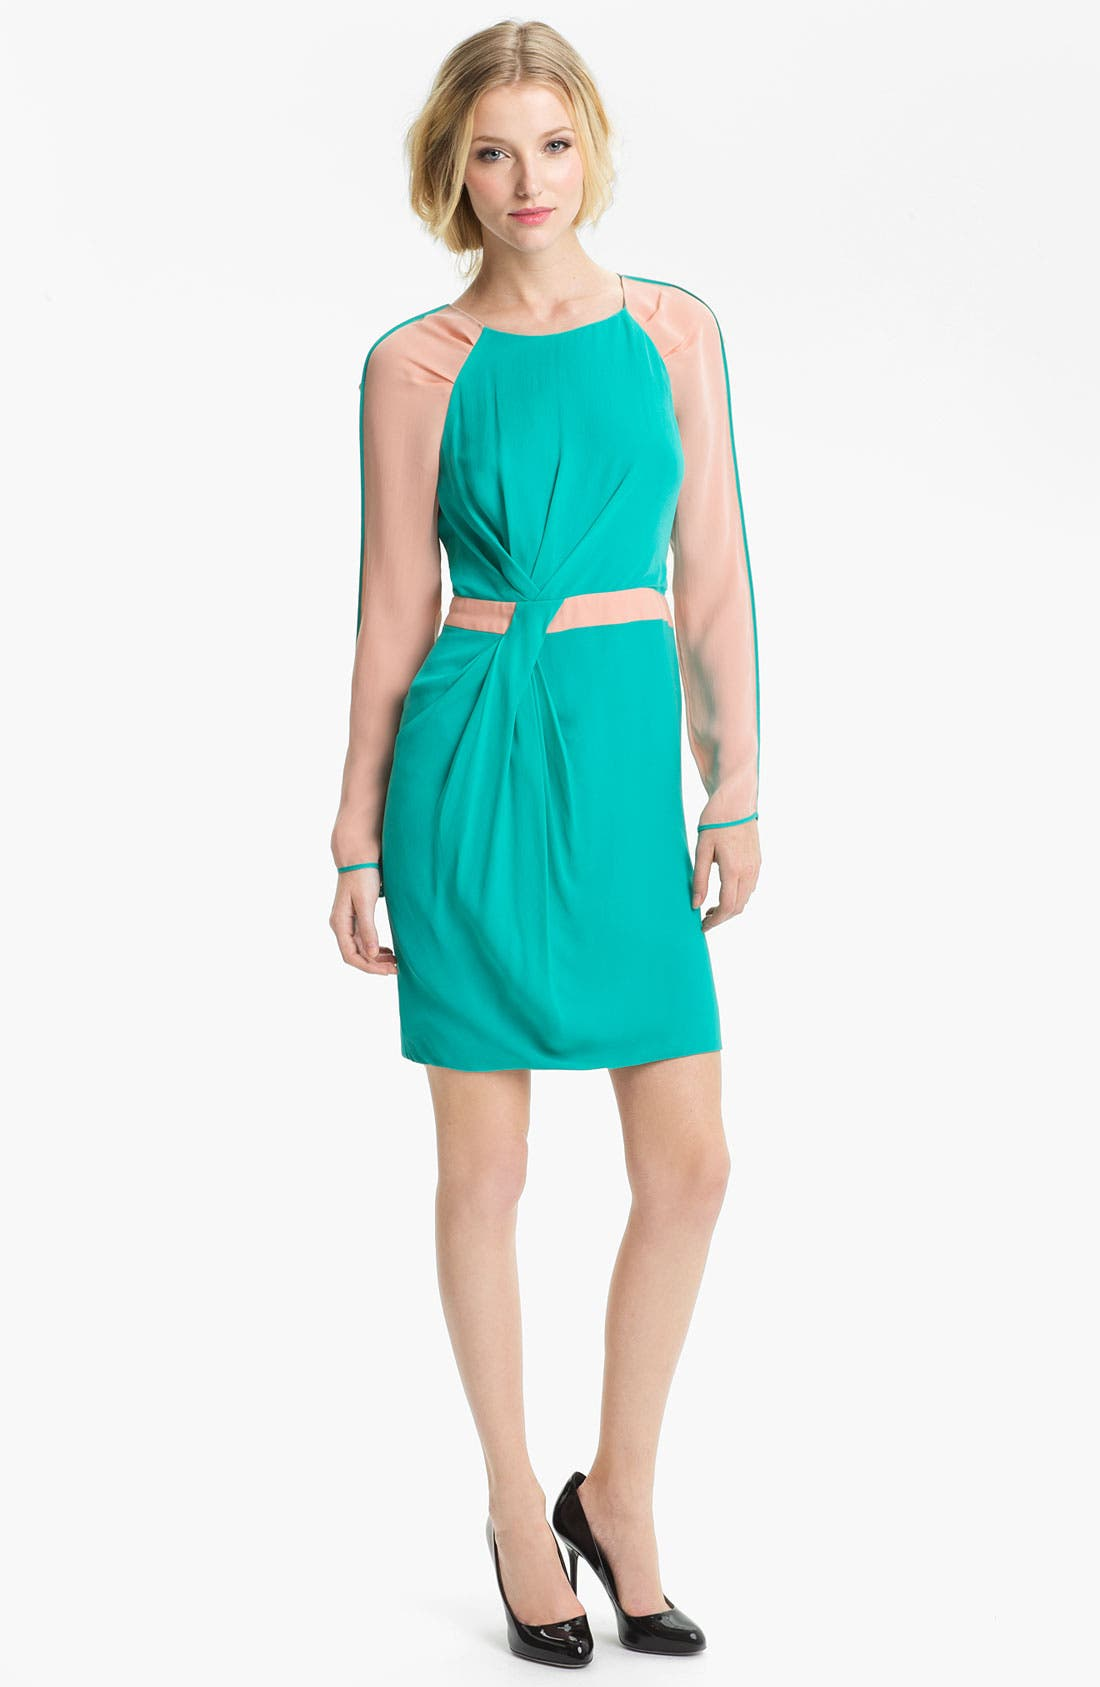 Alternate Image 1 Selected - Rebecca Minkoff 'Sacramento' Colorblock Silk Dress